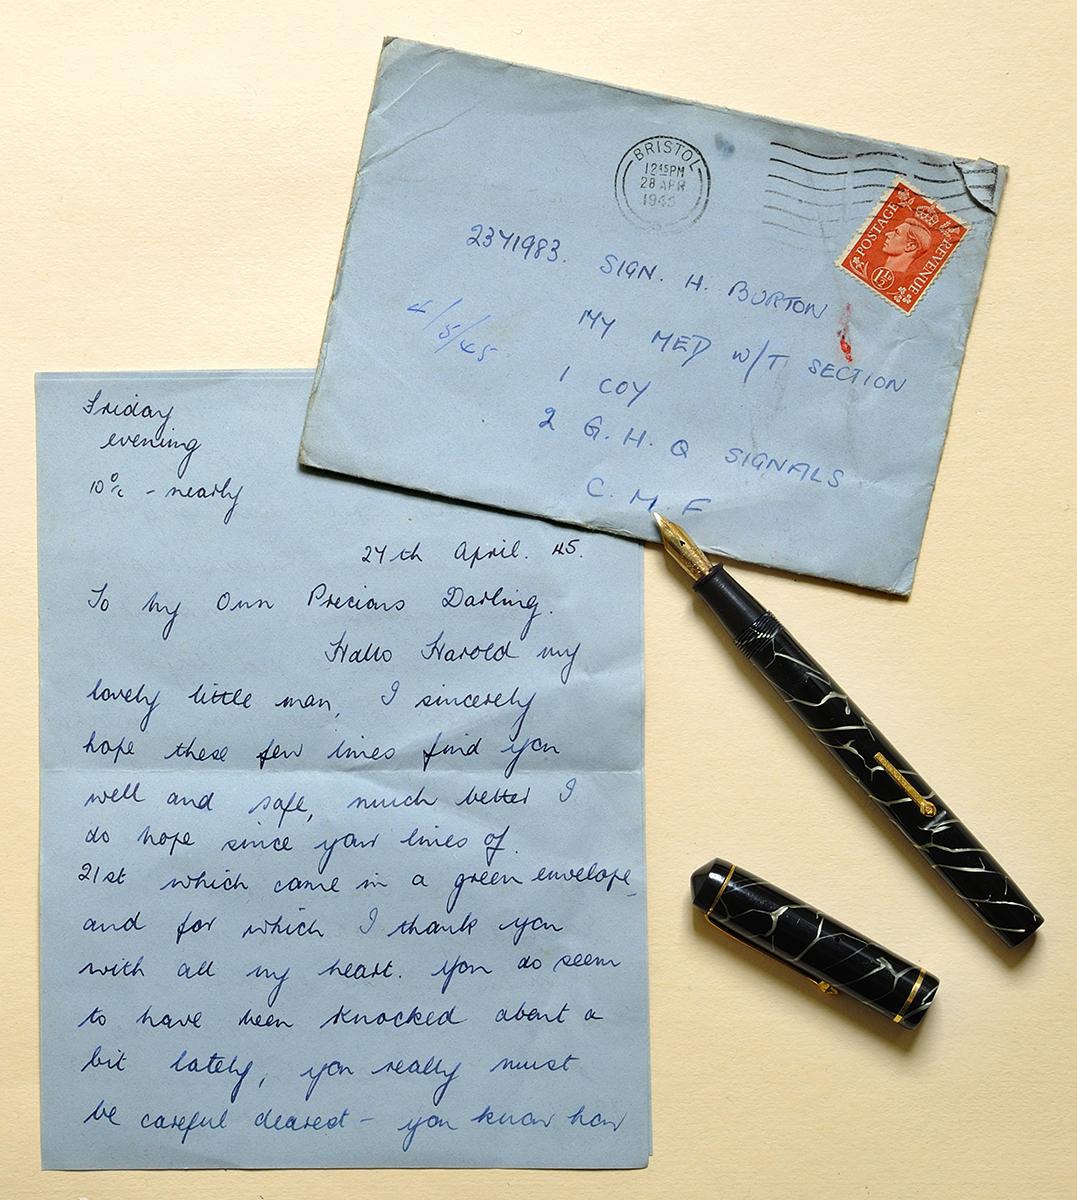 Letter...27th April 1945